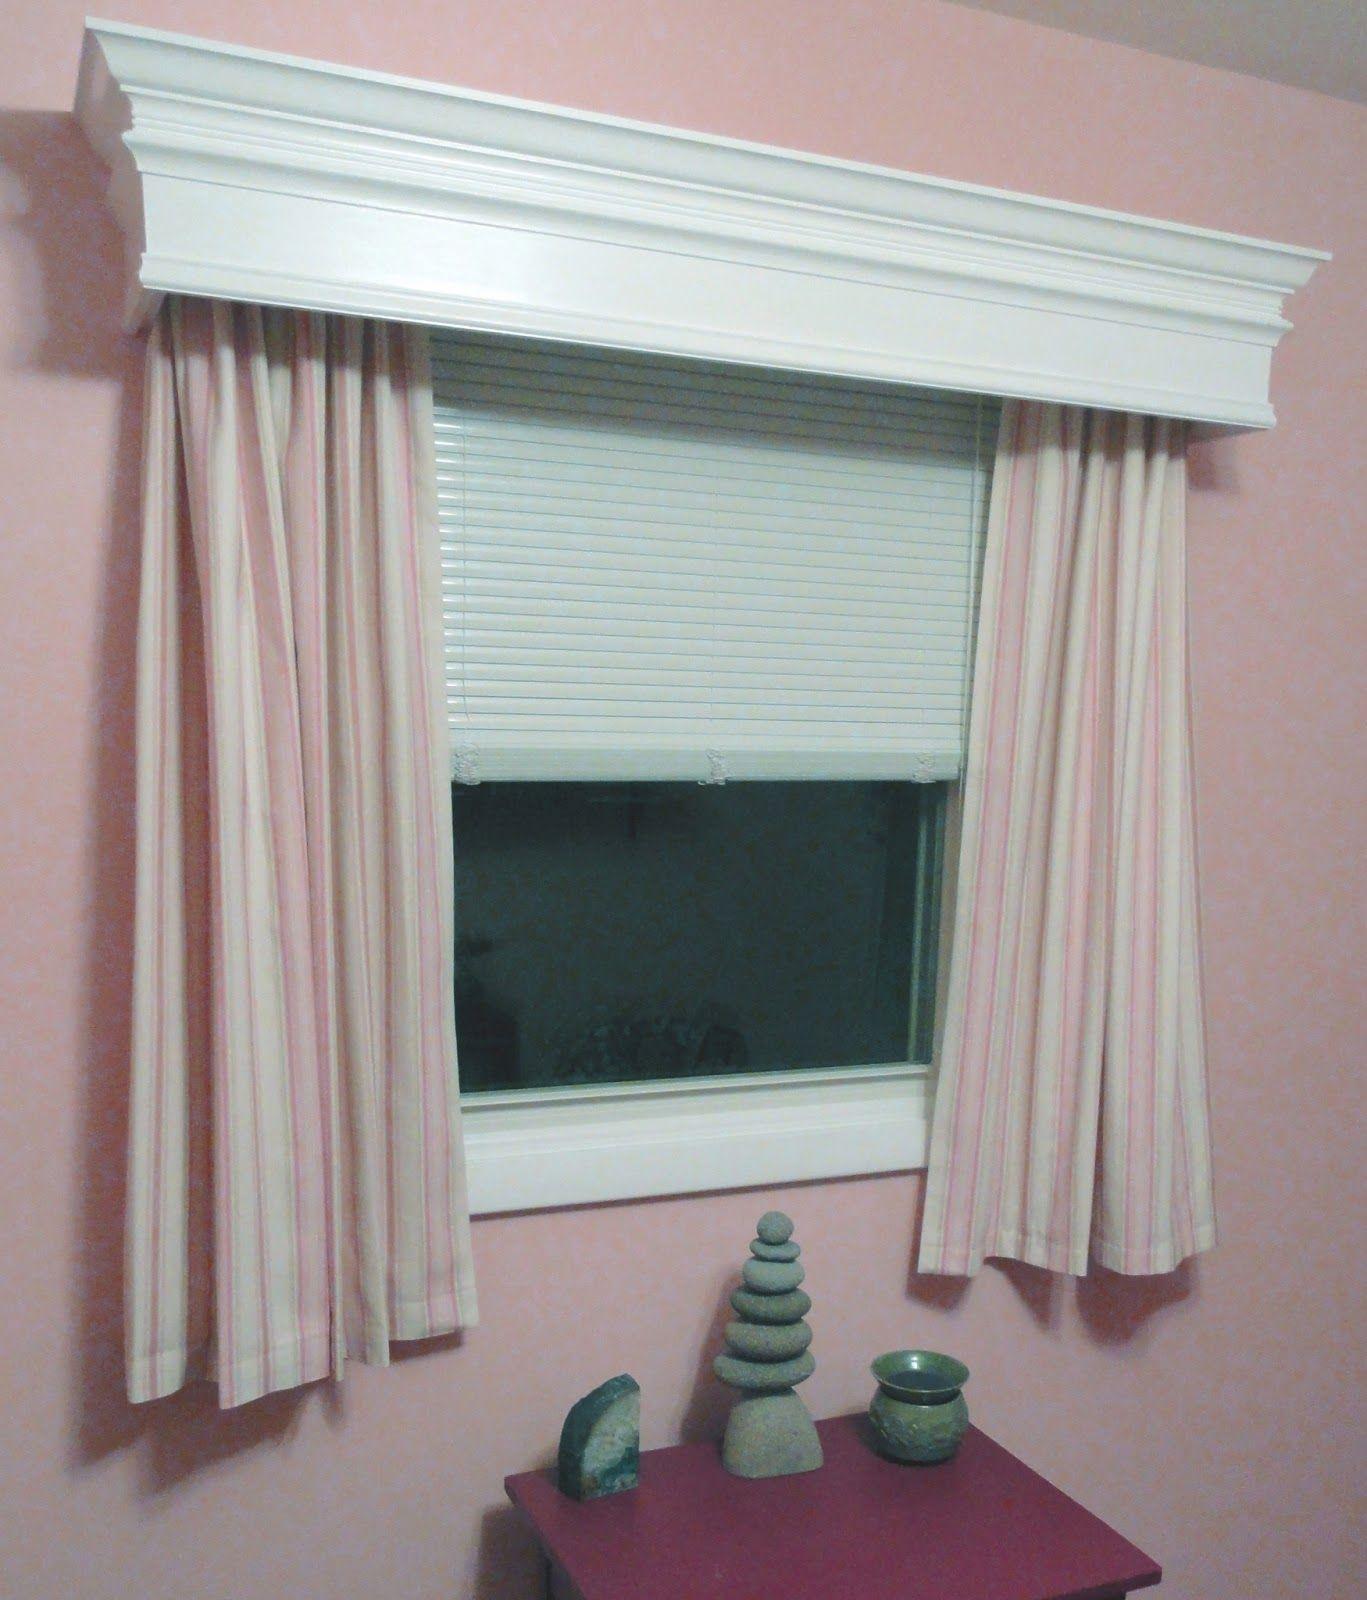 wooden window cornice ideas - Google Search | Abode ...